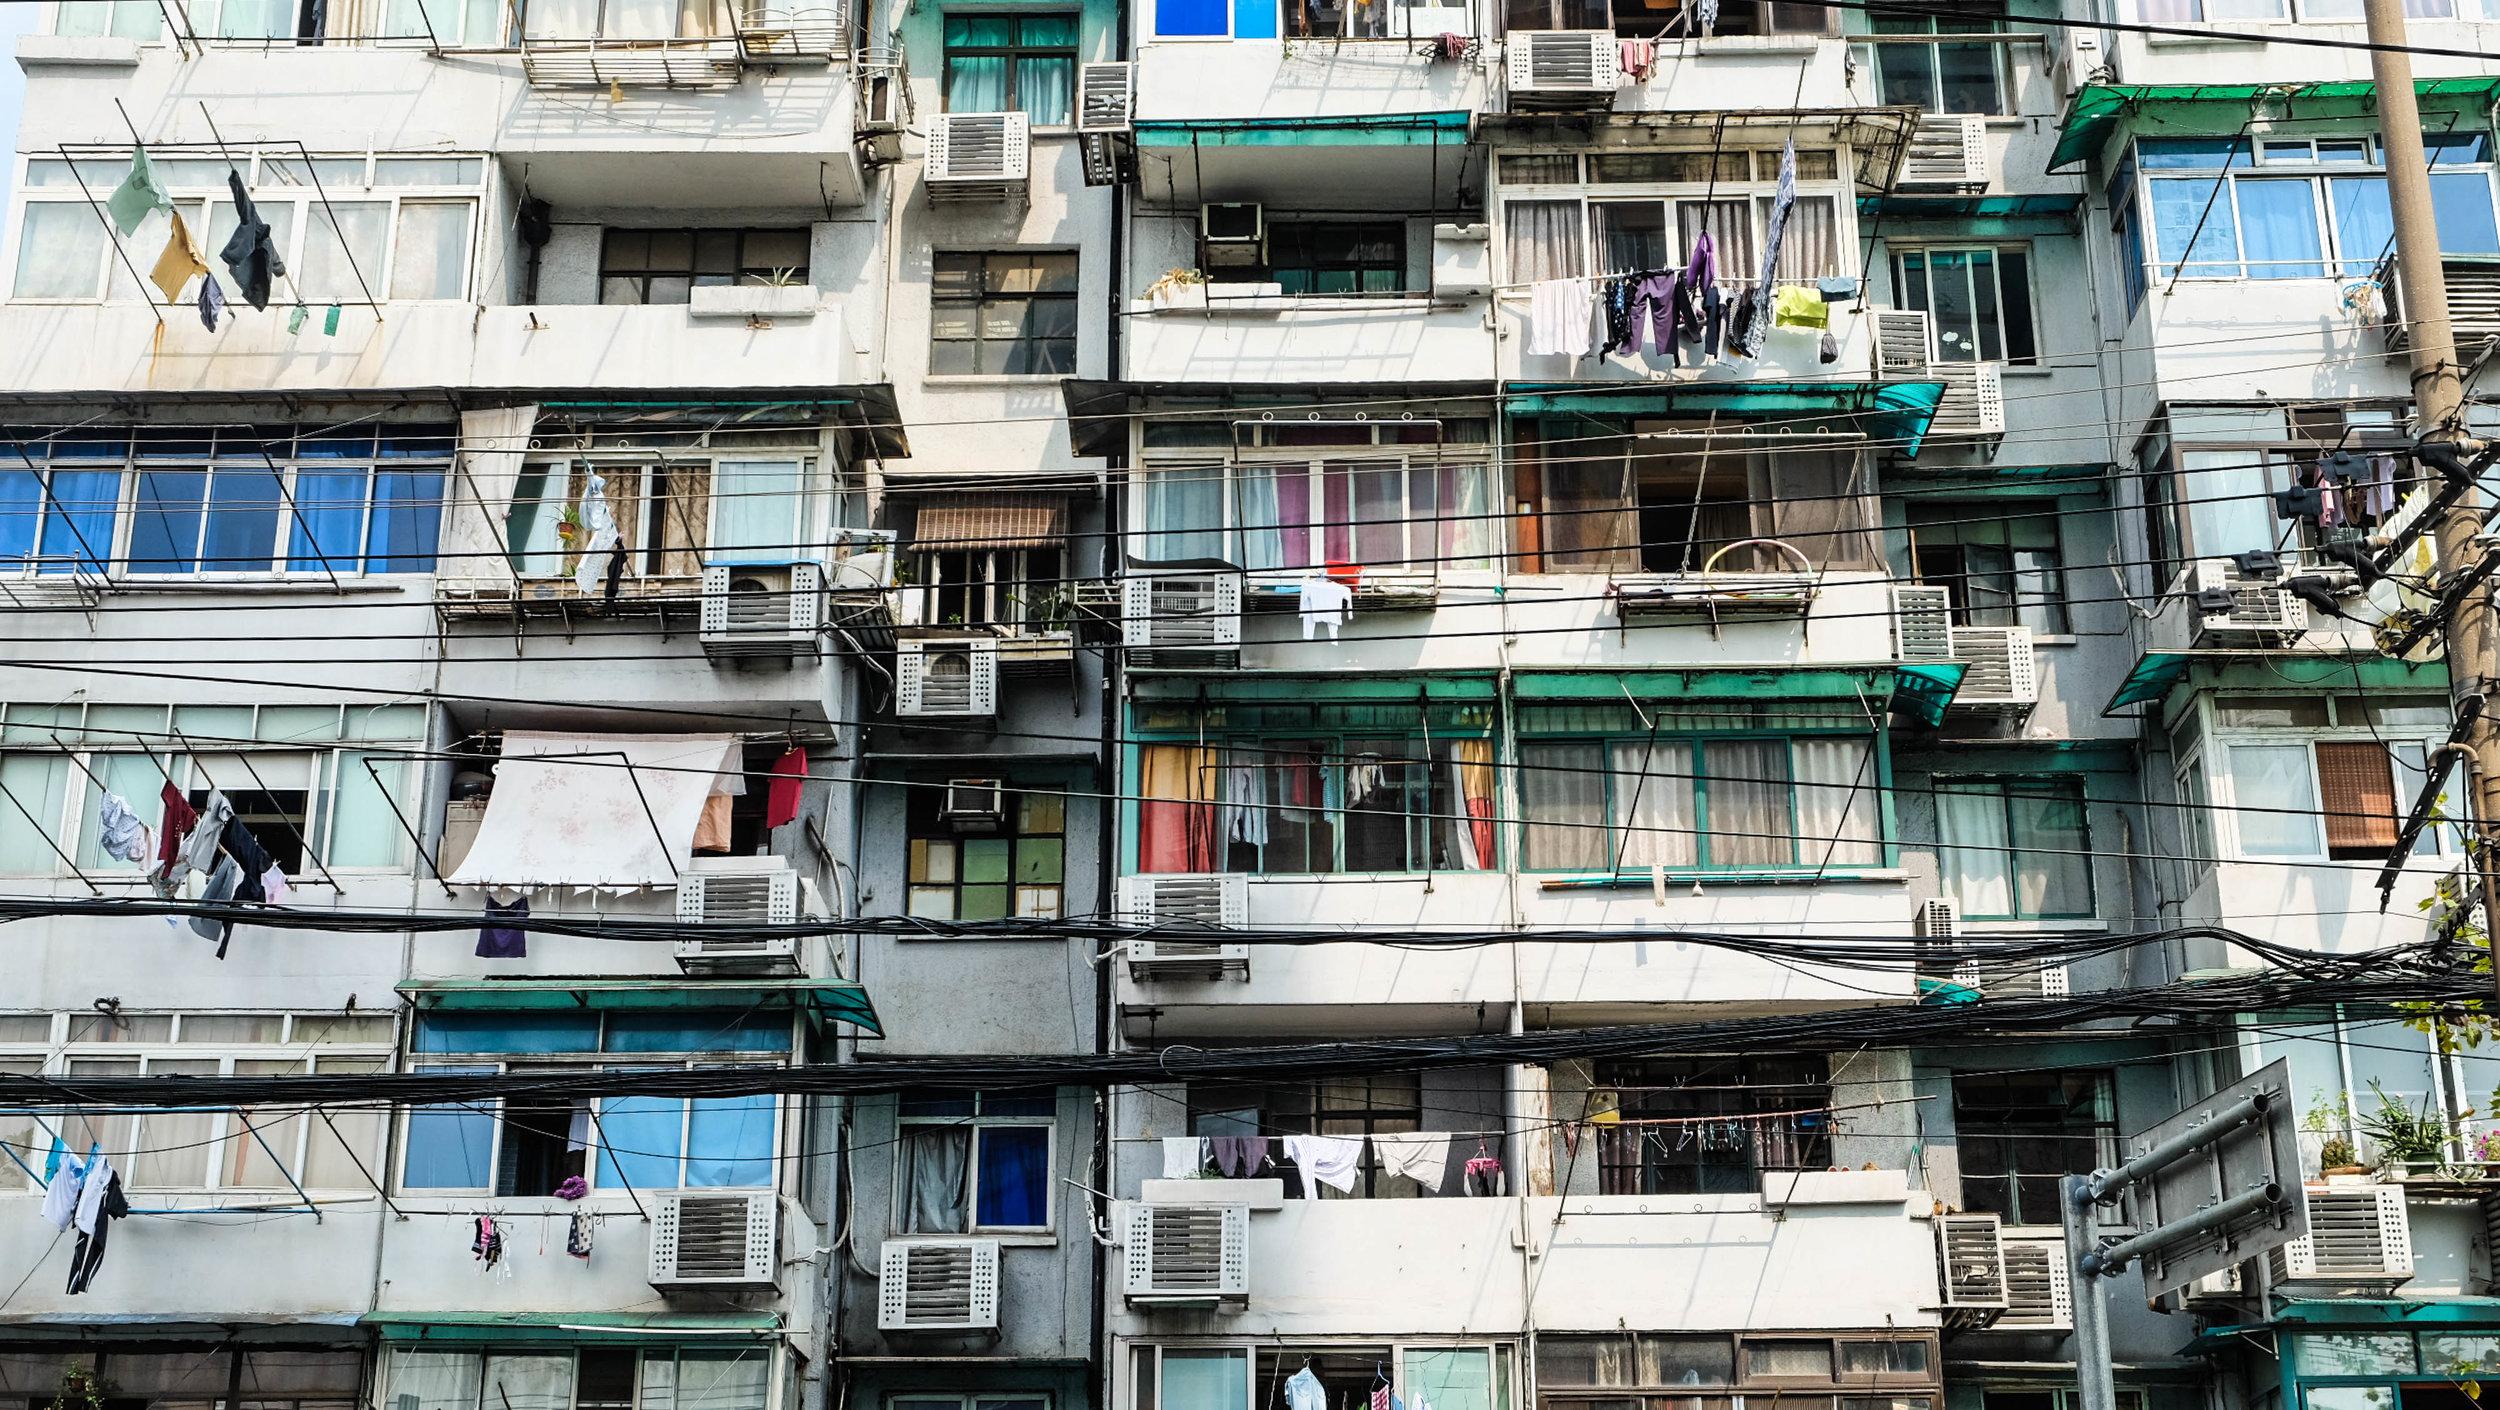 Shanghai's residential area outside of the city center.